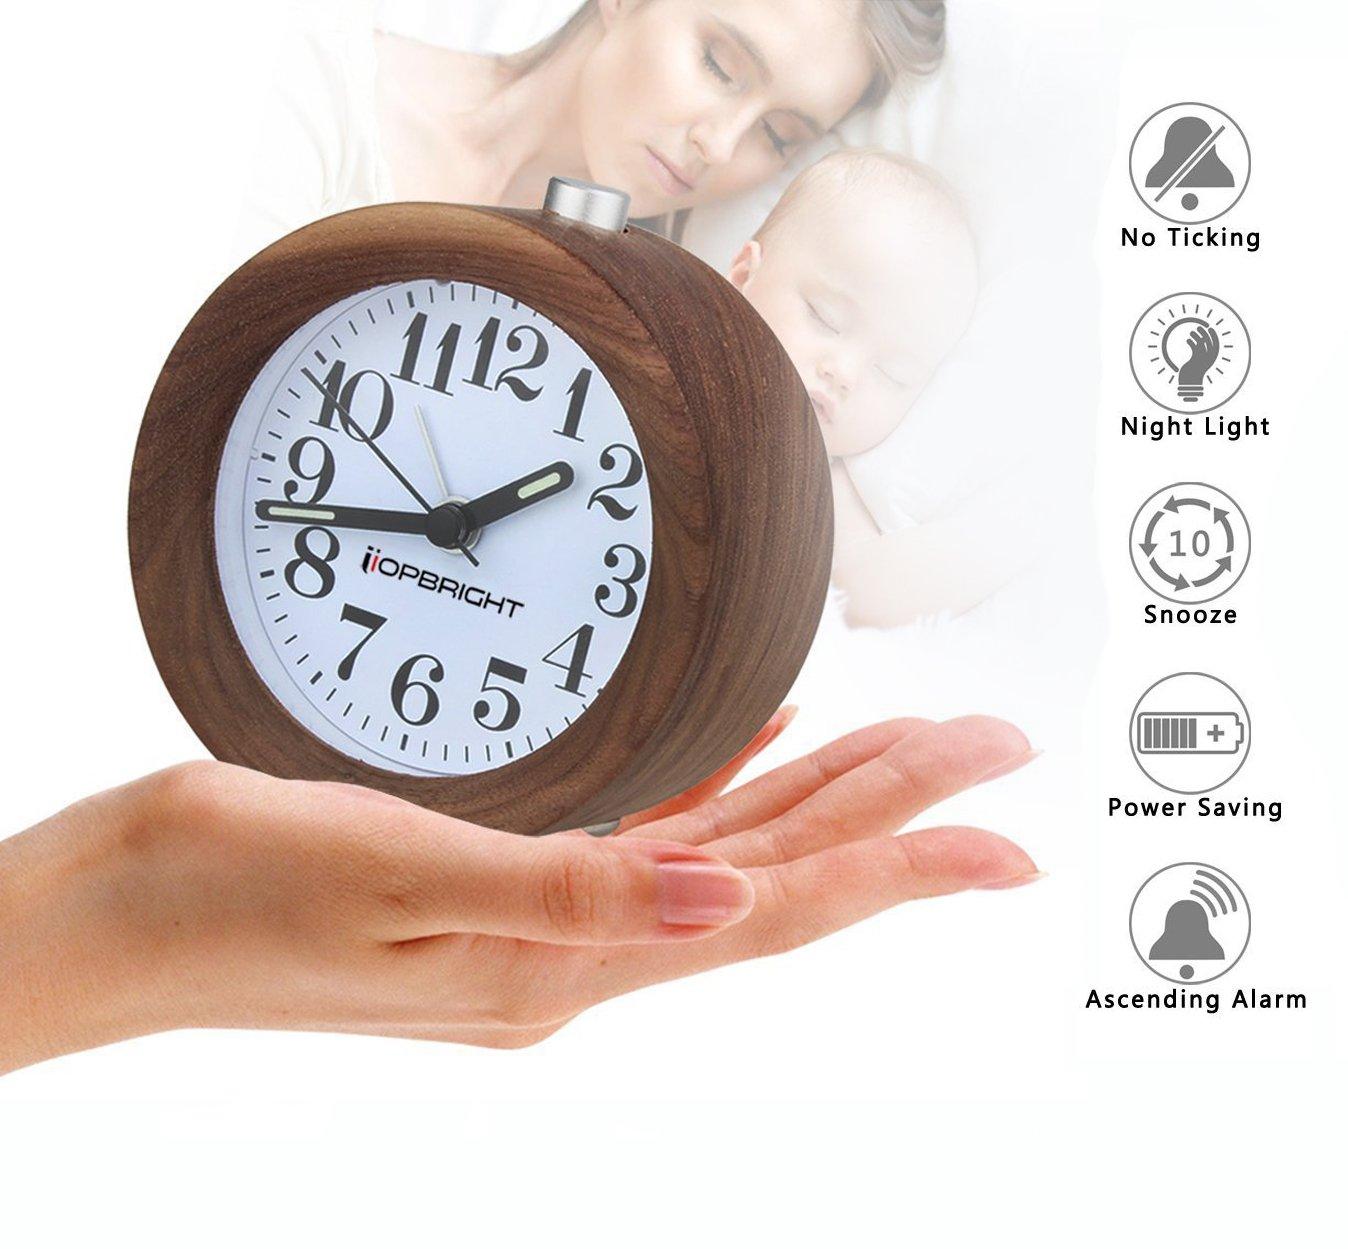 Crazydream Small Bedroom Silent Alarm Clock,Creative High Quality Walnut Wood Clock Travel Clock,Nightlight,Snooze,Silent Sweep Seconds,No Ticking,Luminous Hands,Battery Power (Walnut)